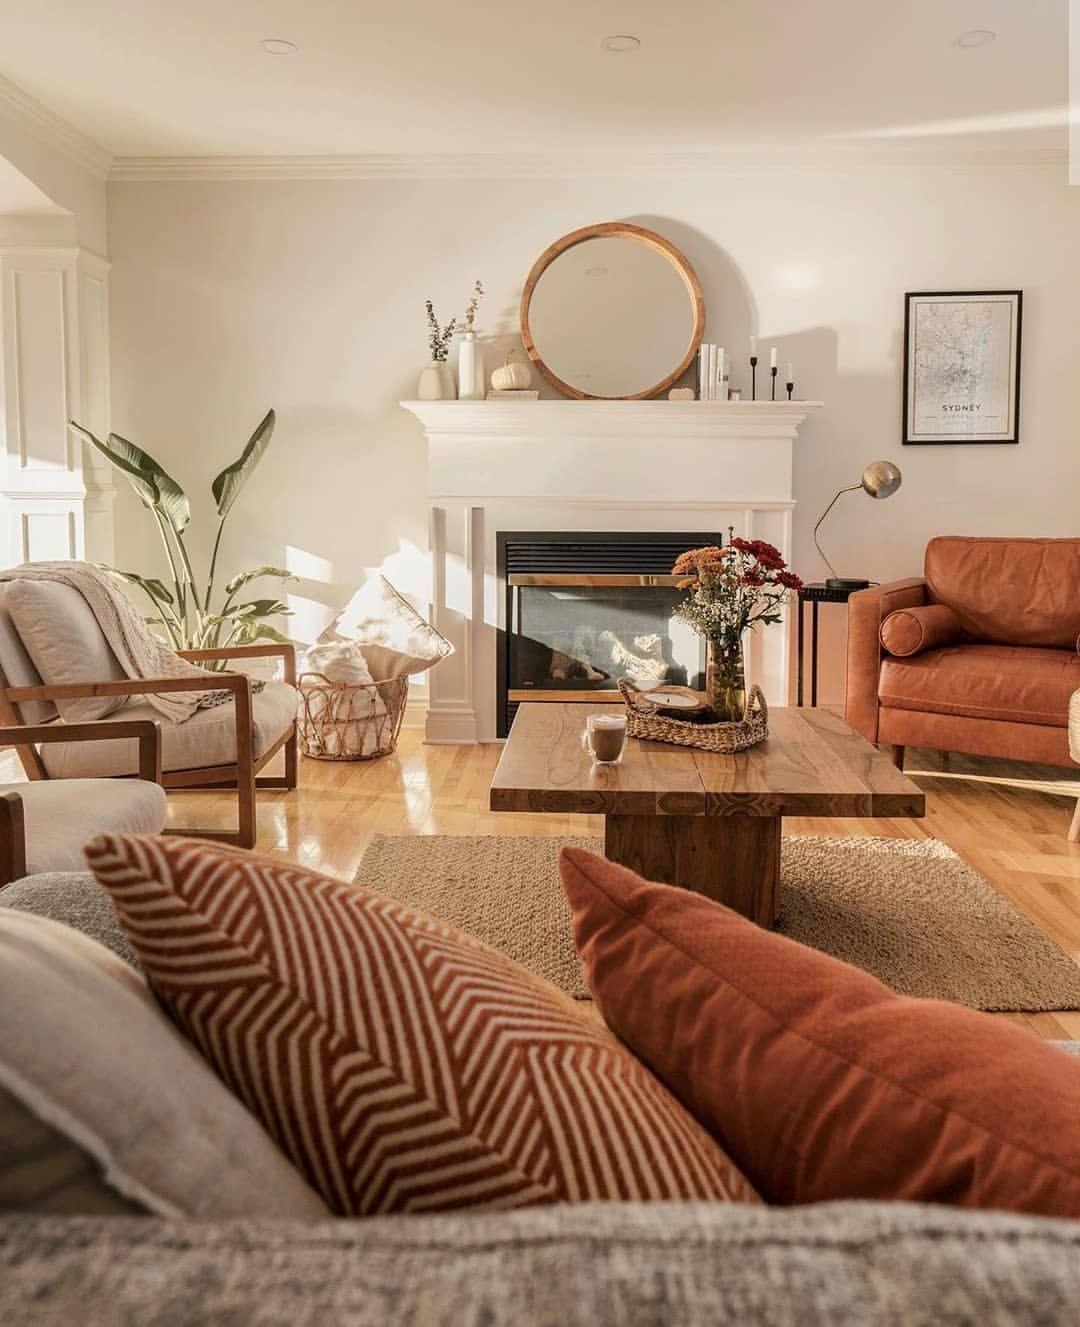 Cinnamon Color Jessmegan Interioryespl